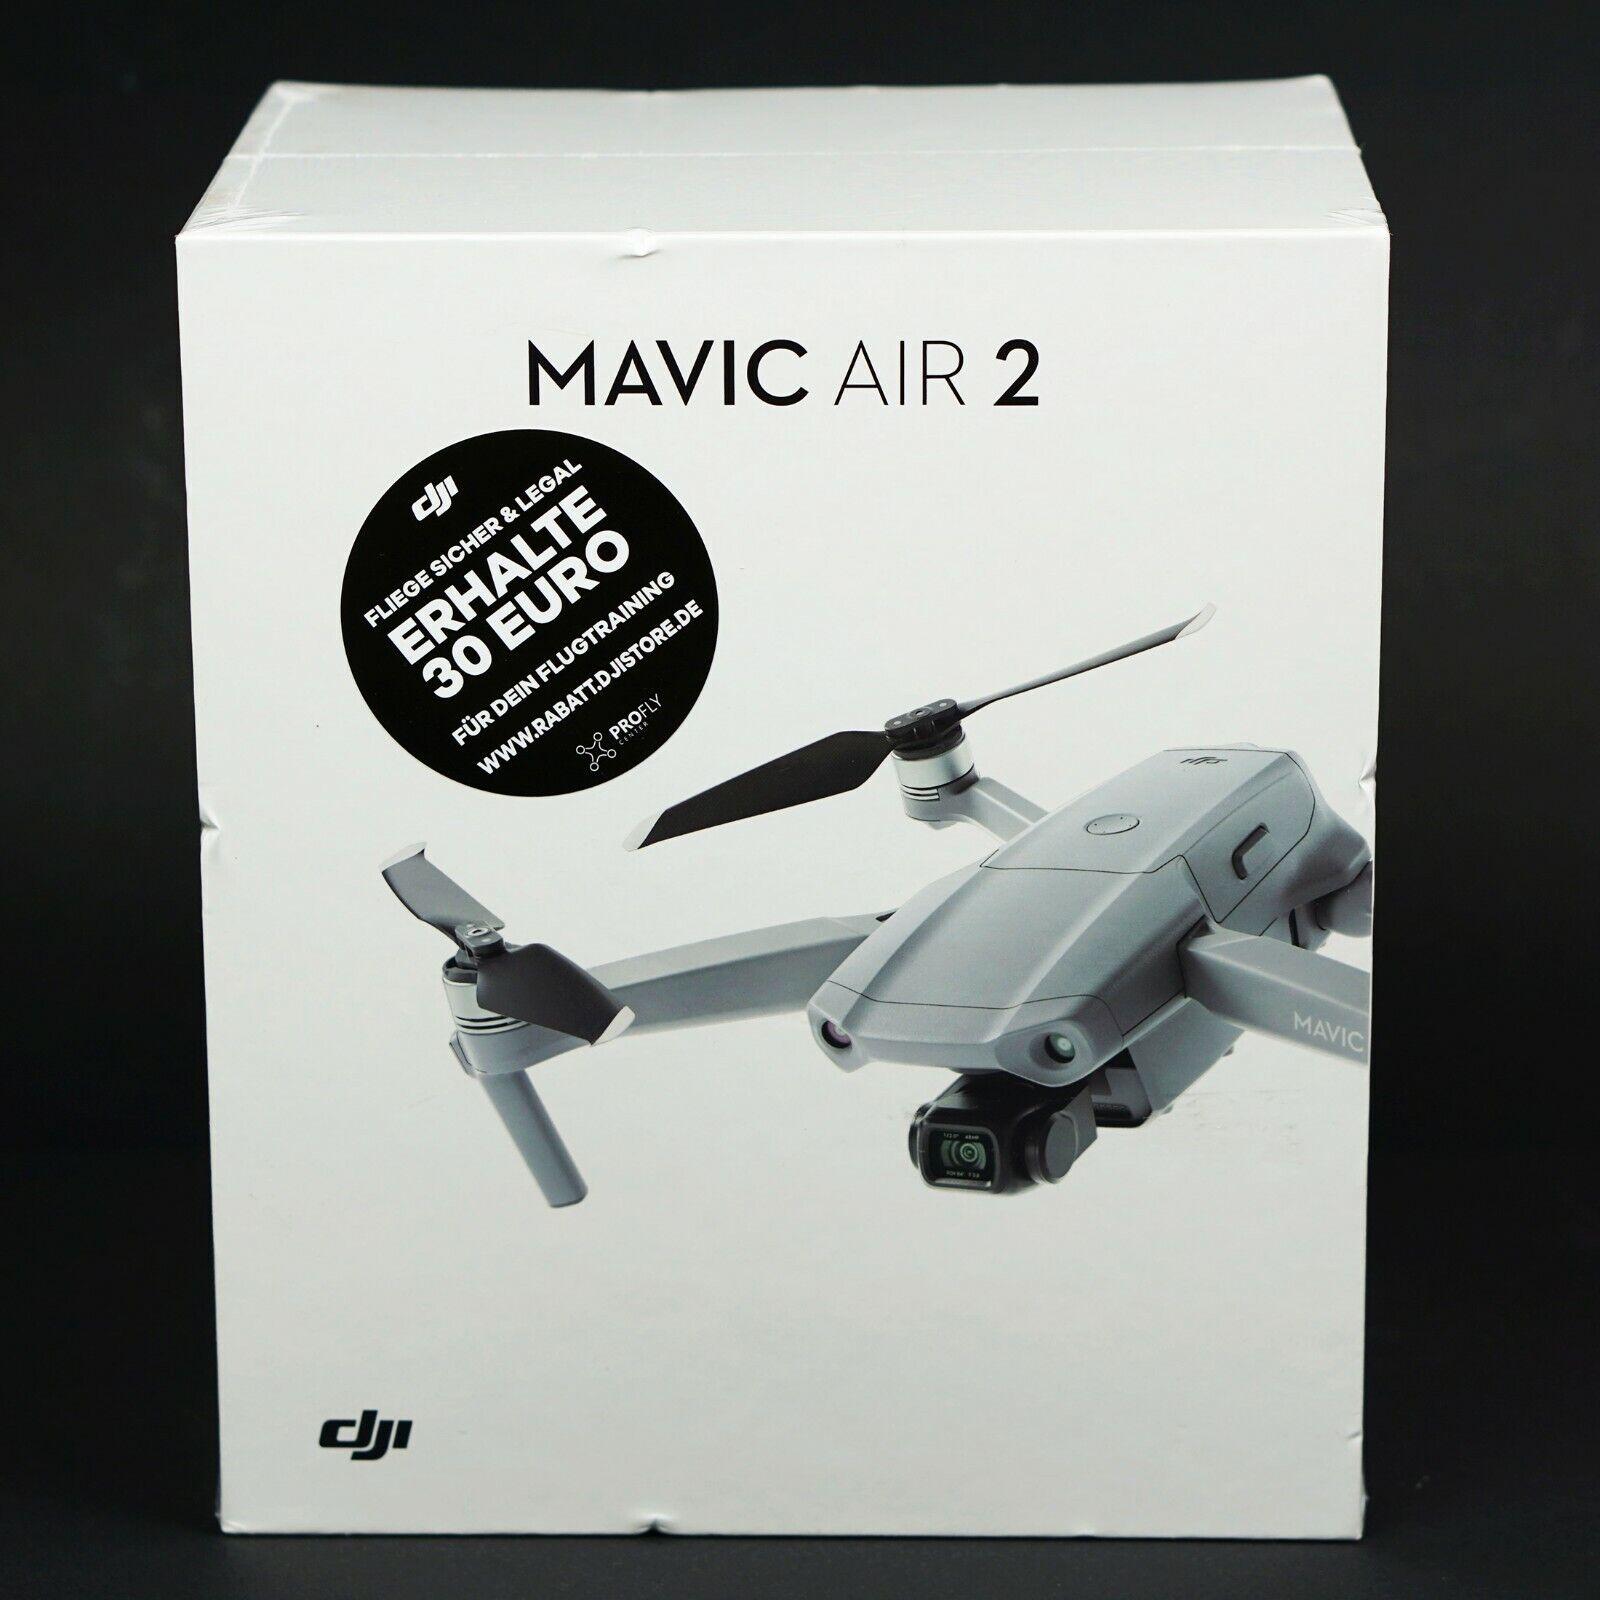 DJI Mavic Air 2 Quadrocopter Drohne RtF Kameraflug, GPS-Funktion 4K BRANDNEU